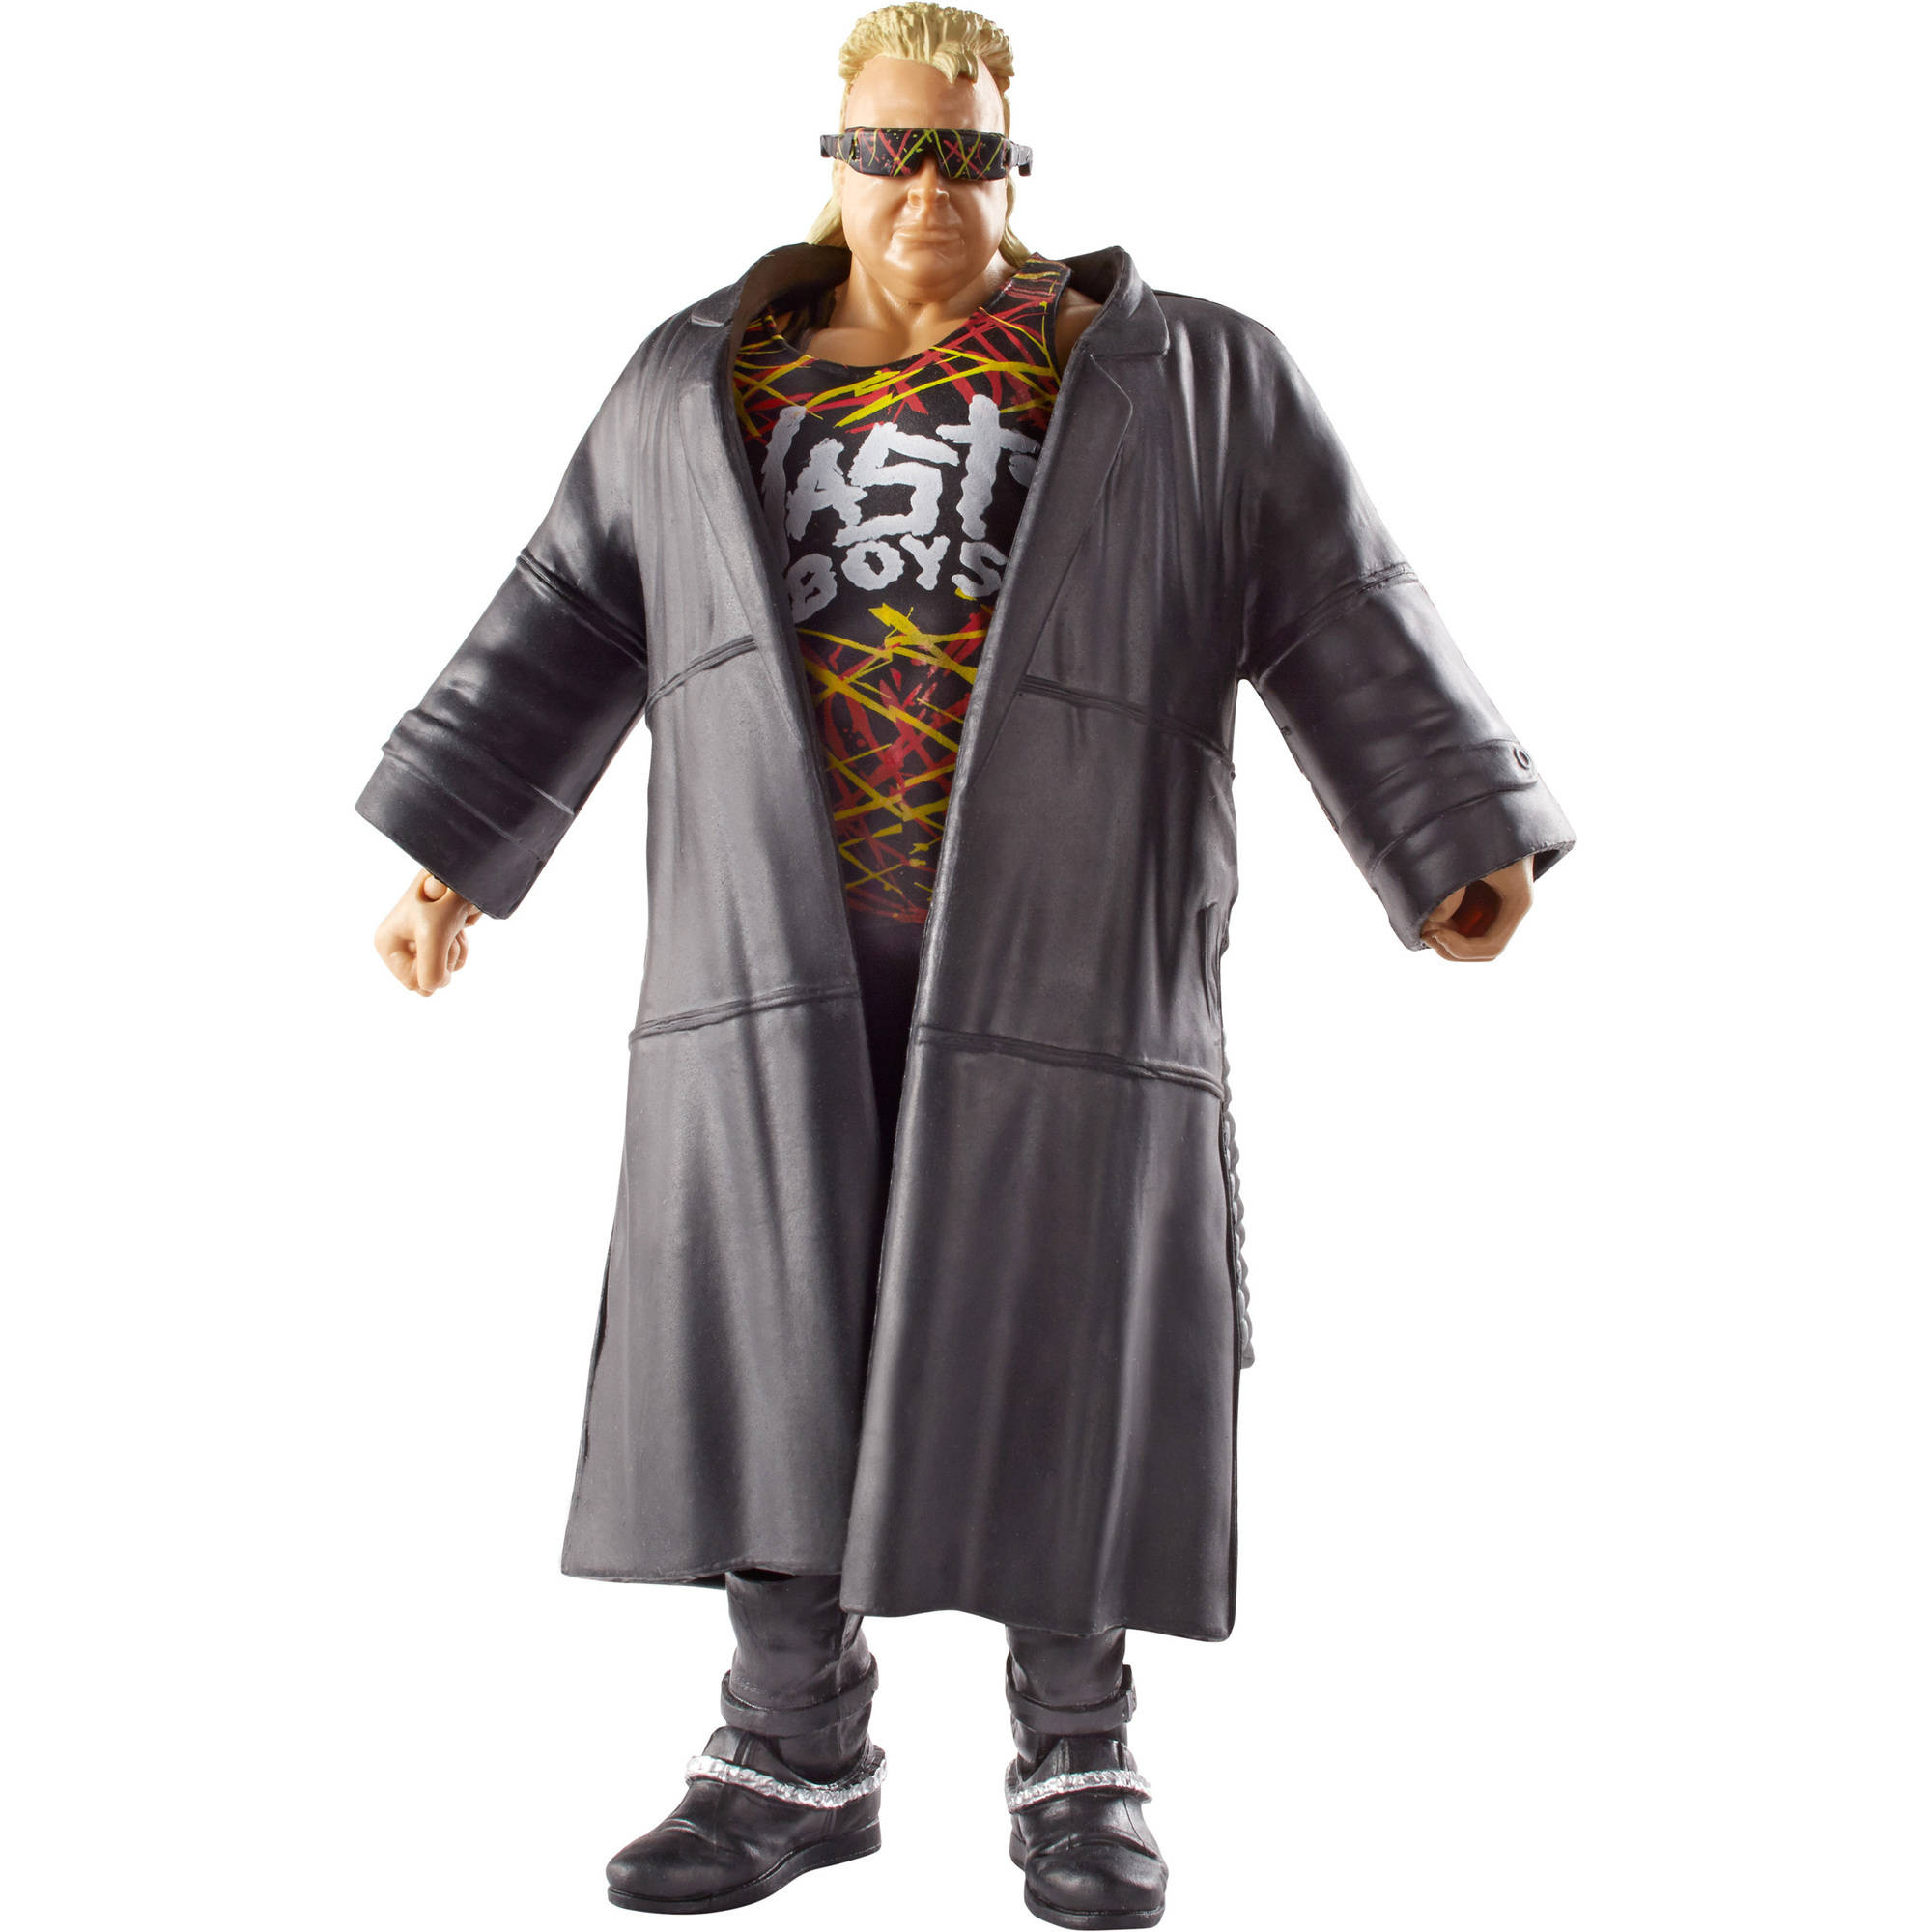 WWE Elite Figure, Nasty Boys Brian Knobbs